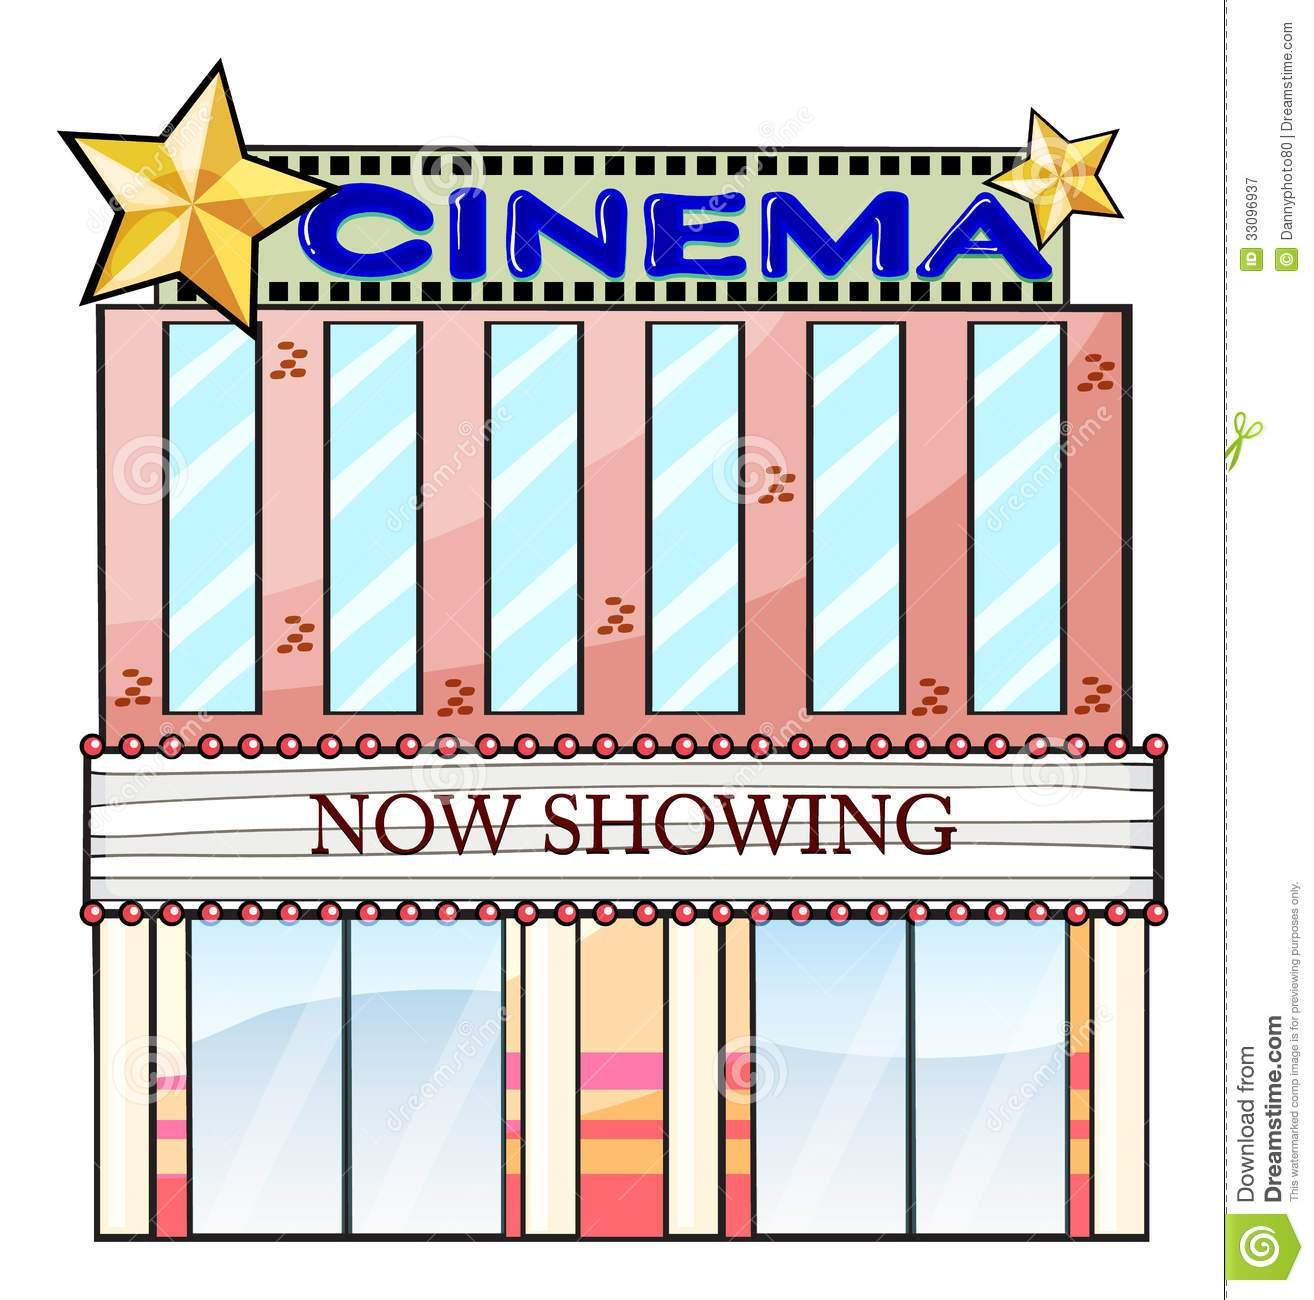 Cinema building clipart 1 » Clipart Portal.